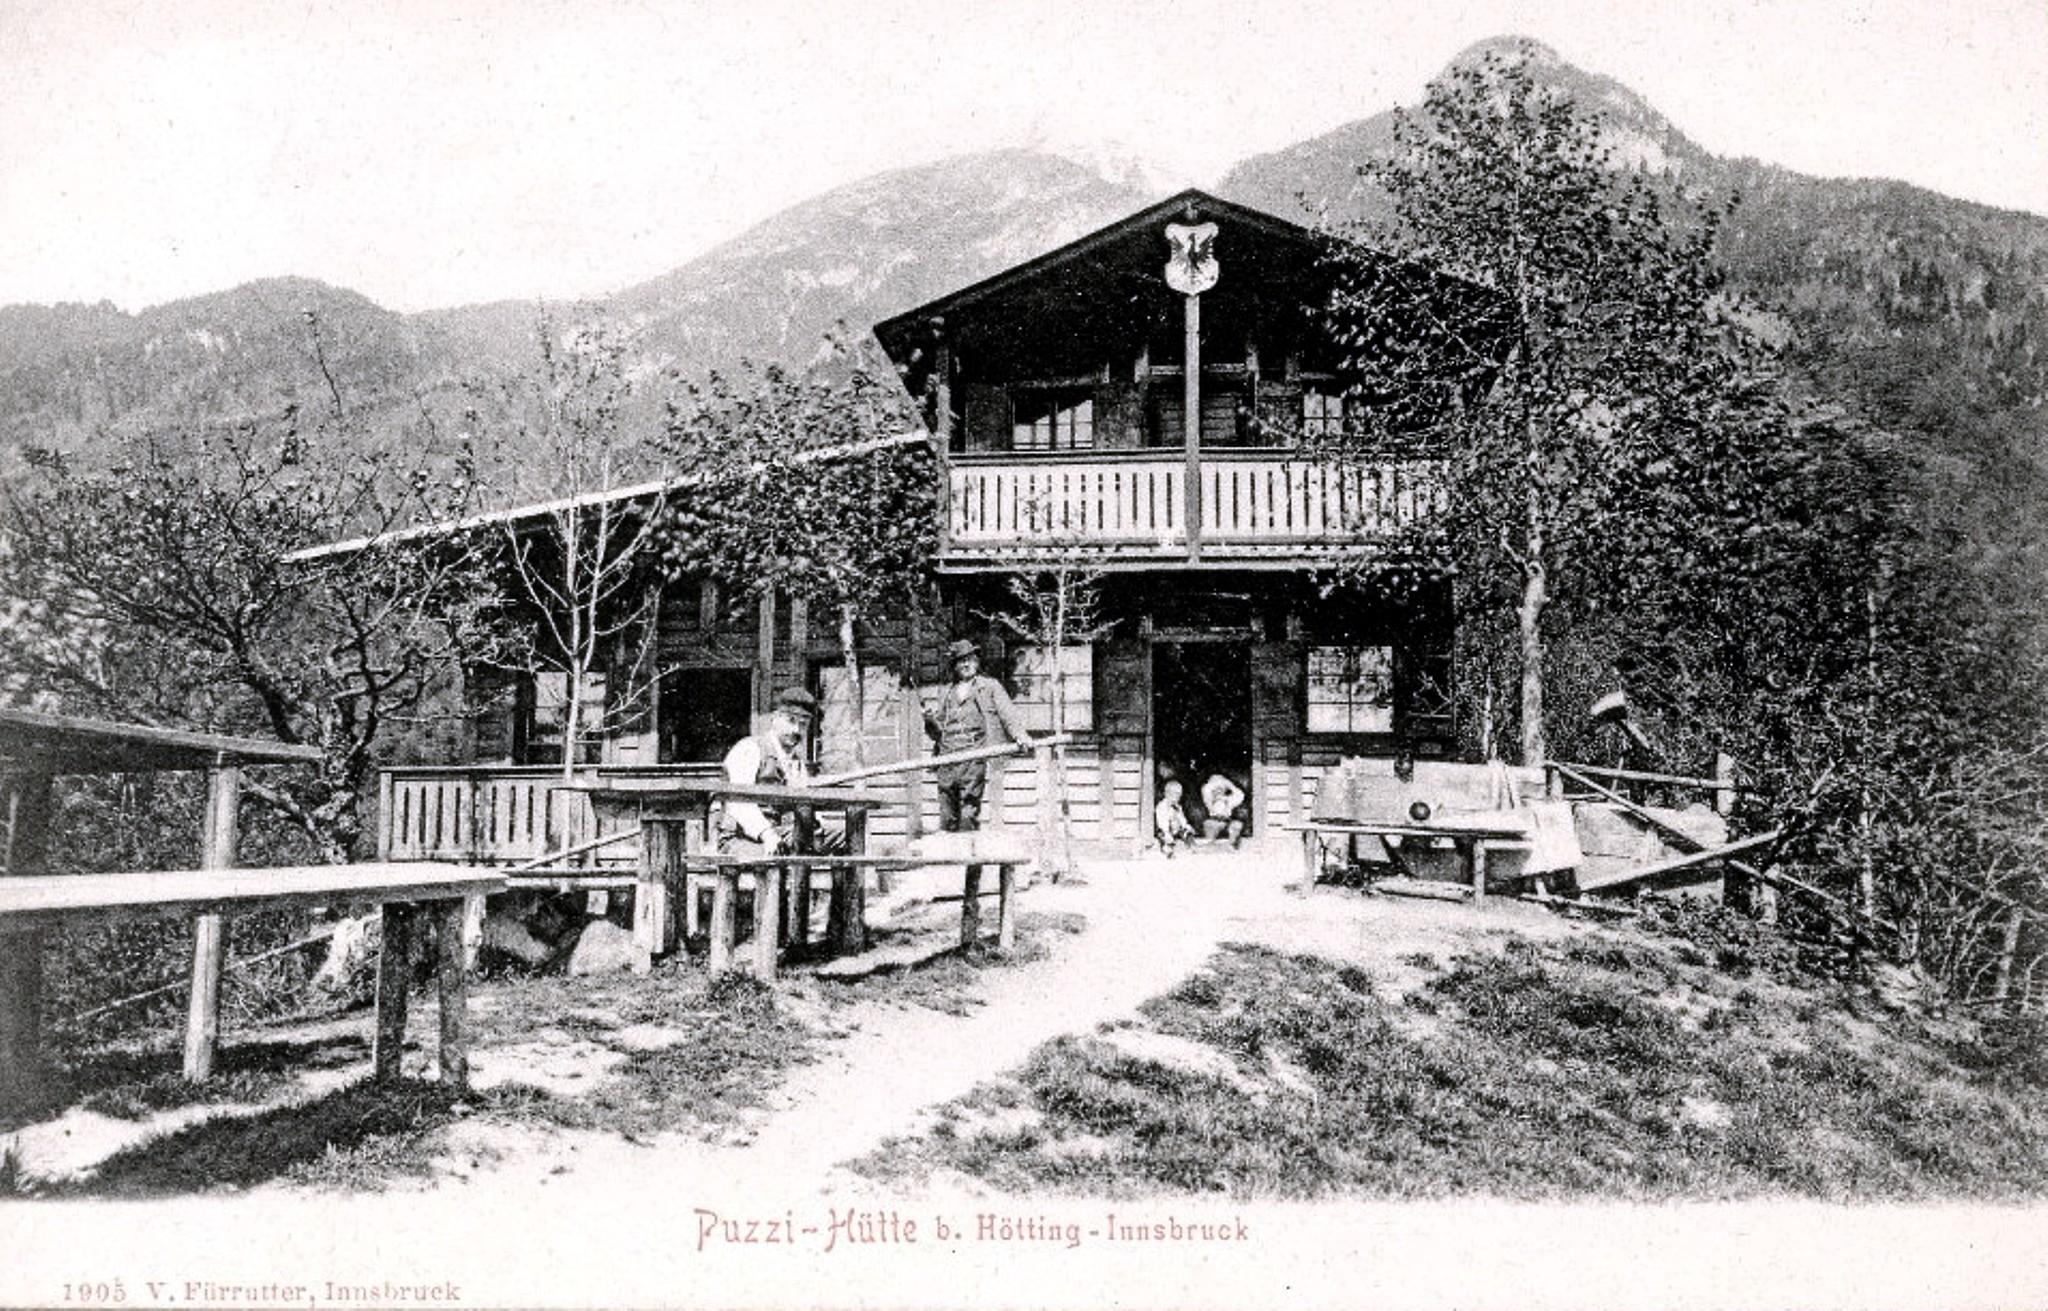 Innsbruck 1905, Buzihütte